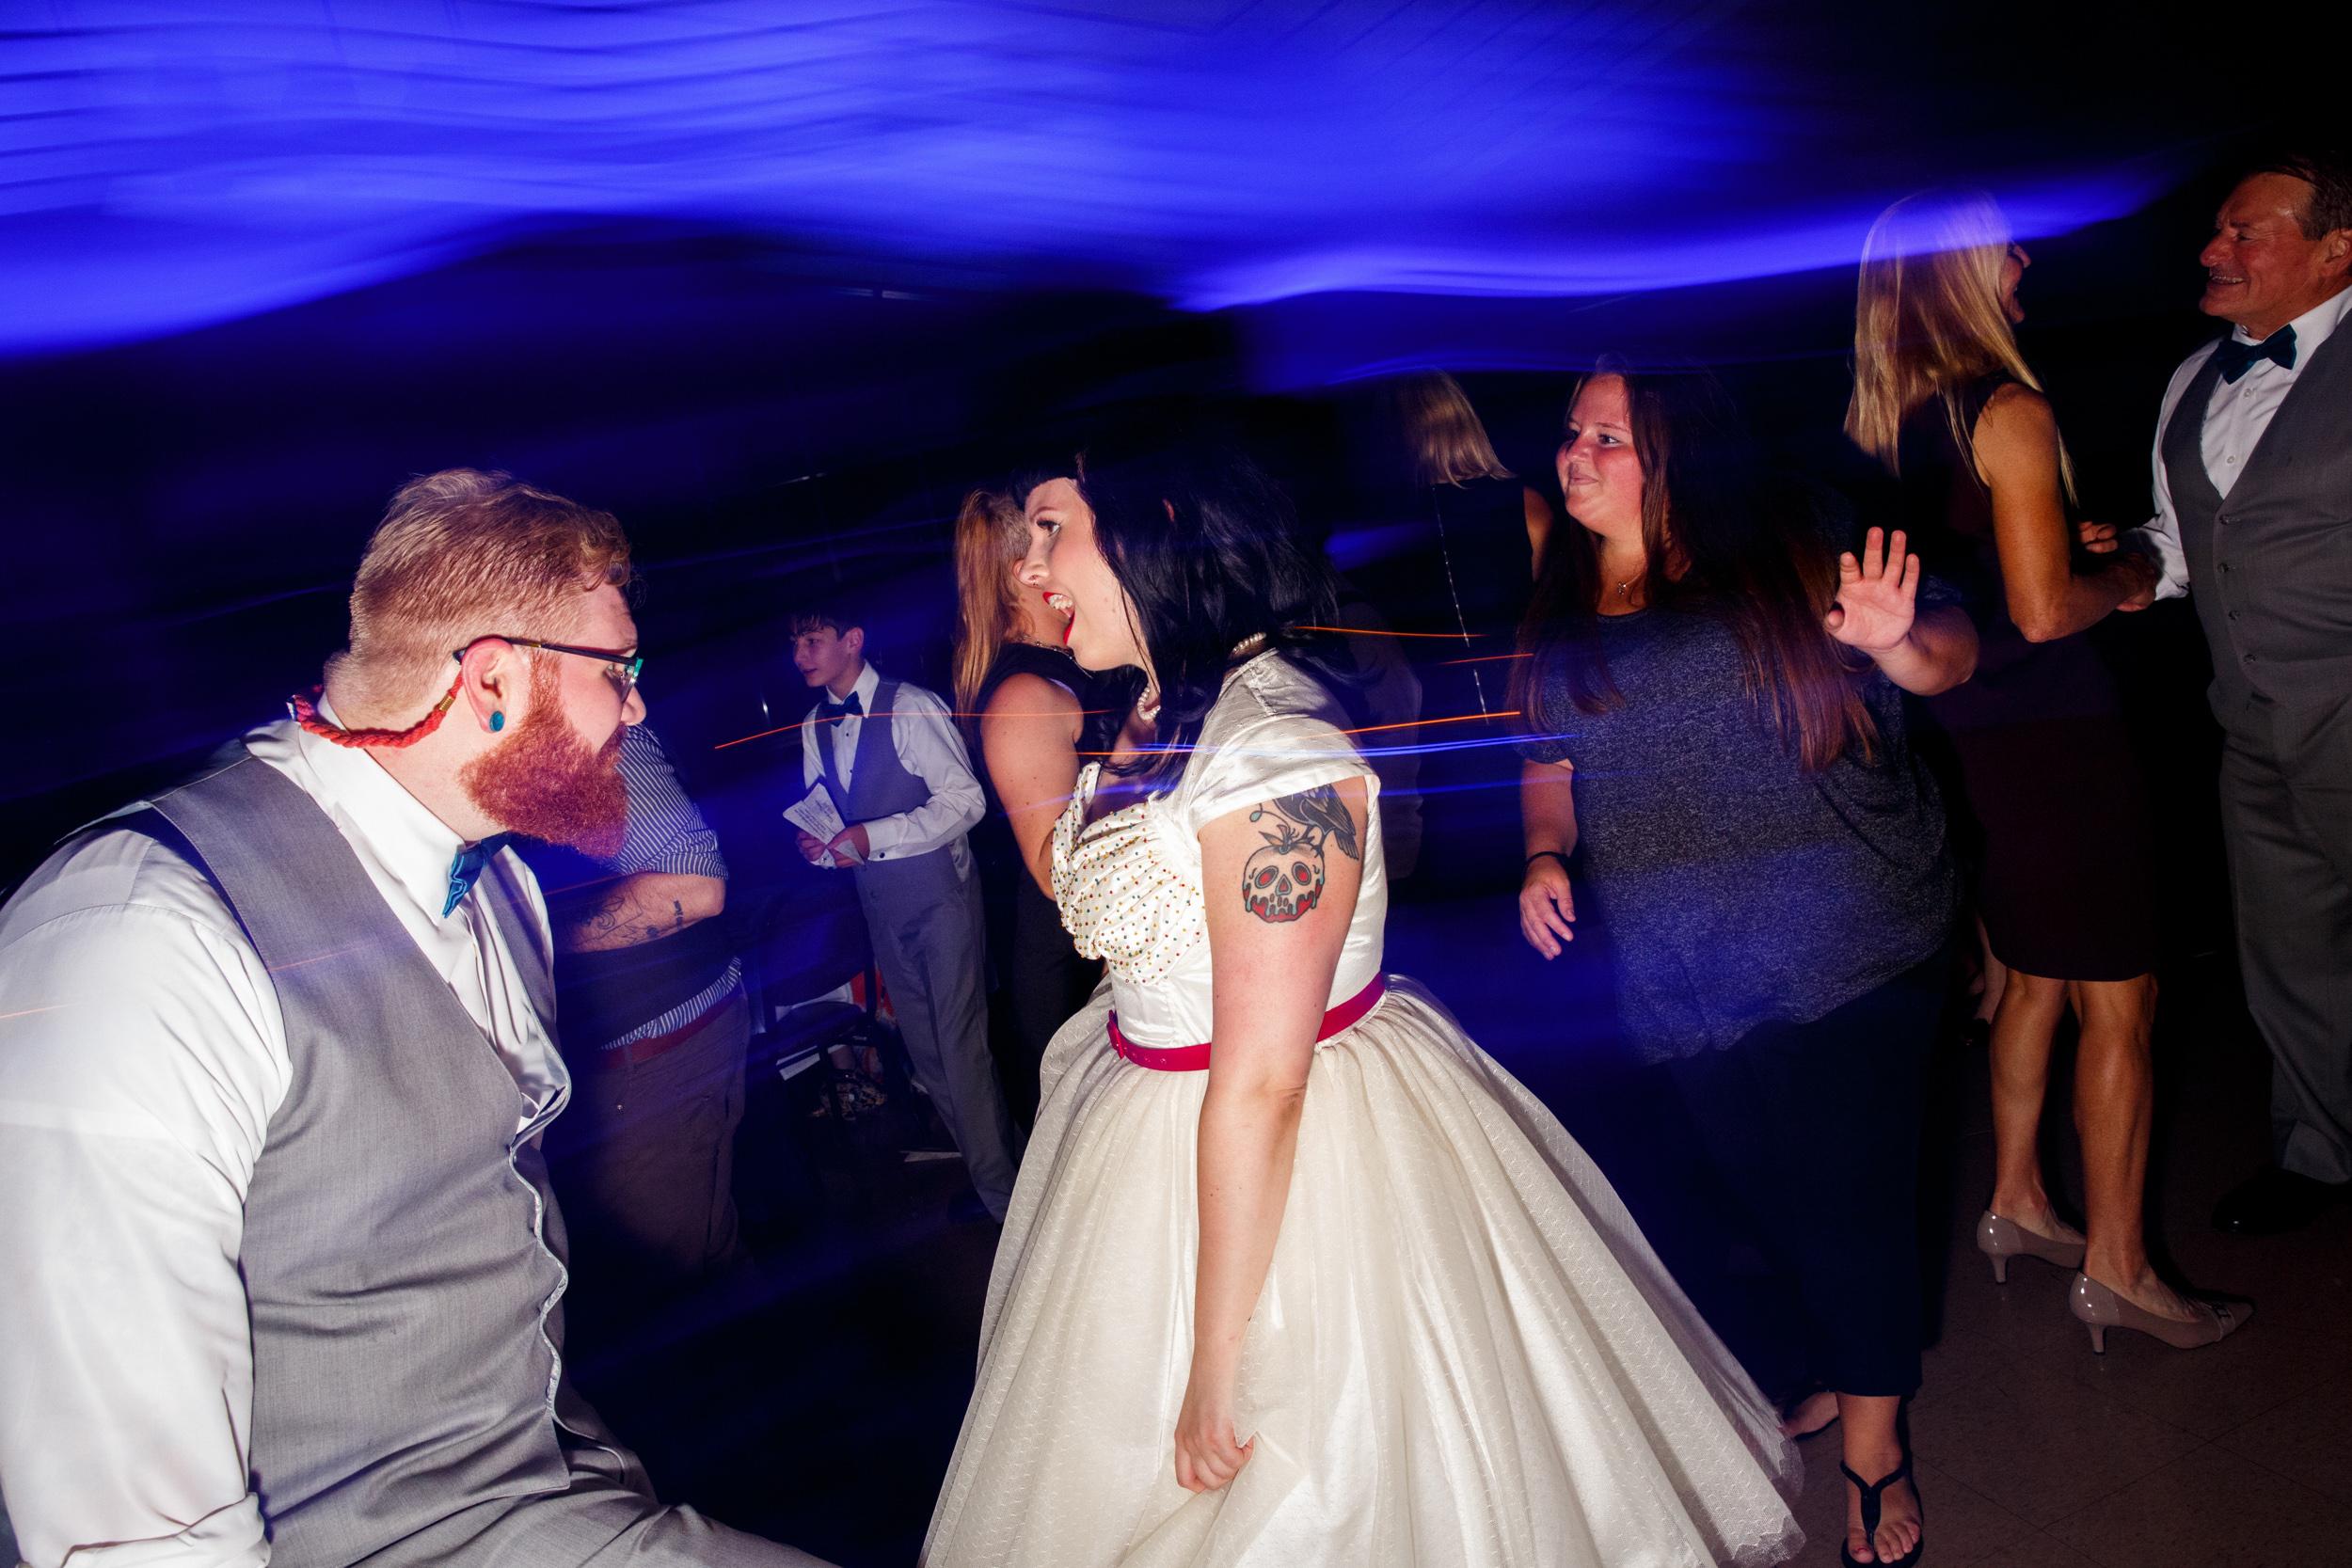 Christian & Sarah wedding photography by Brian milo-270.jpg